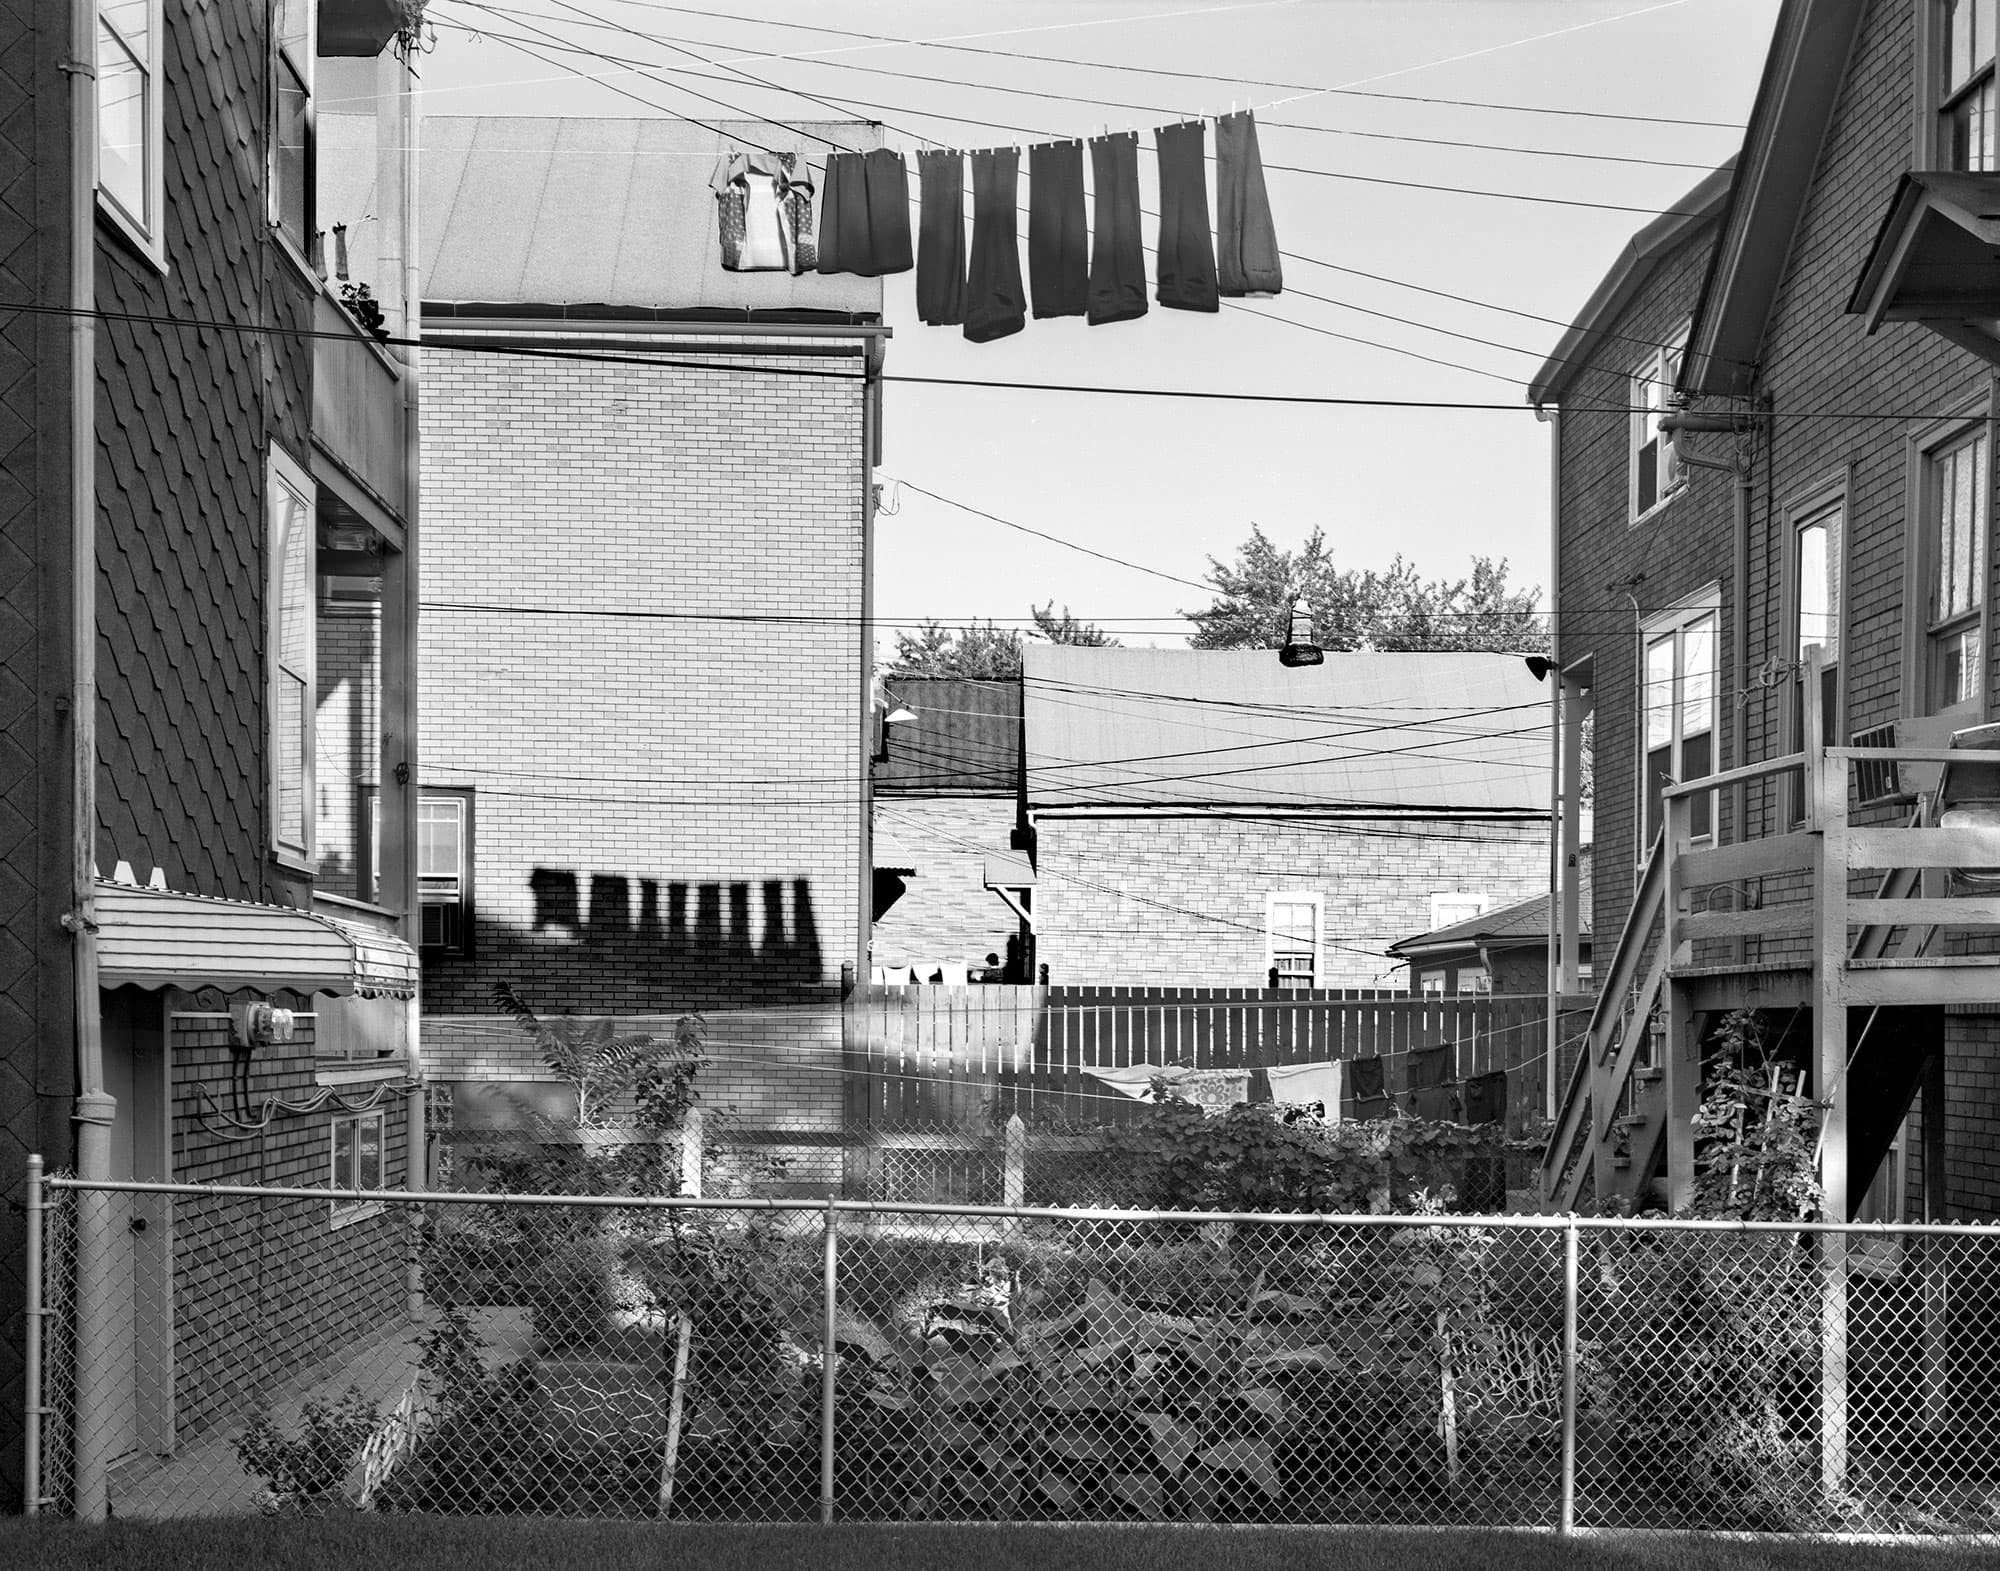 arthur-lazar-Chicago-1975